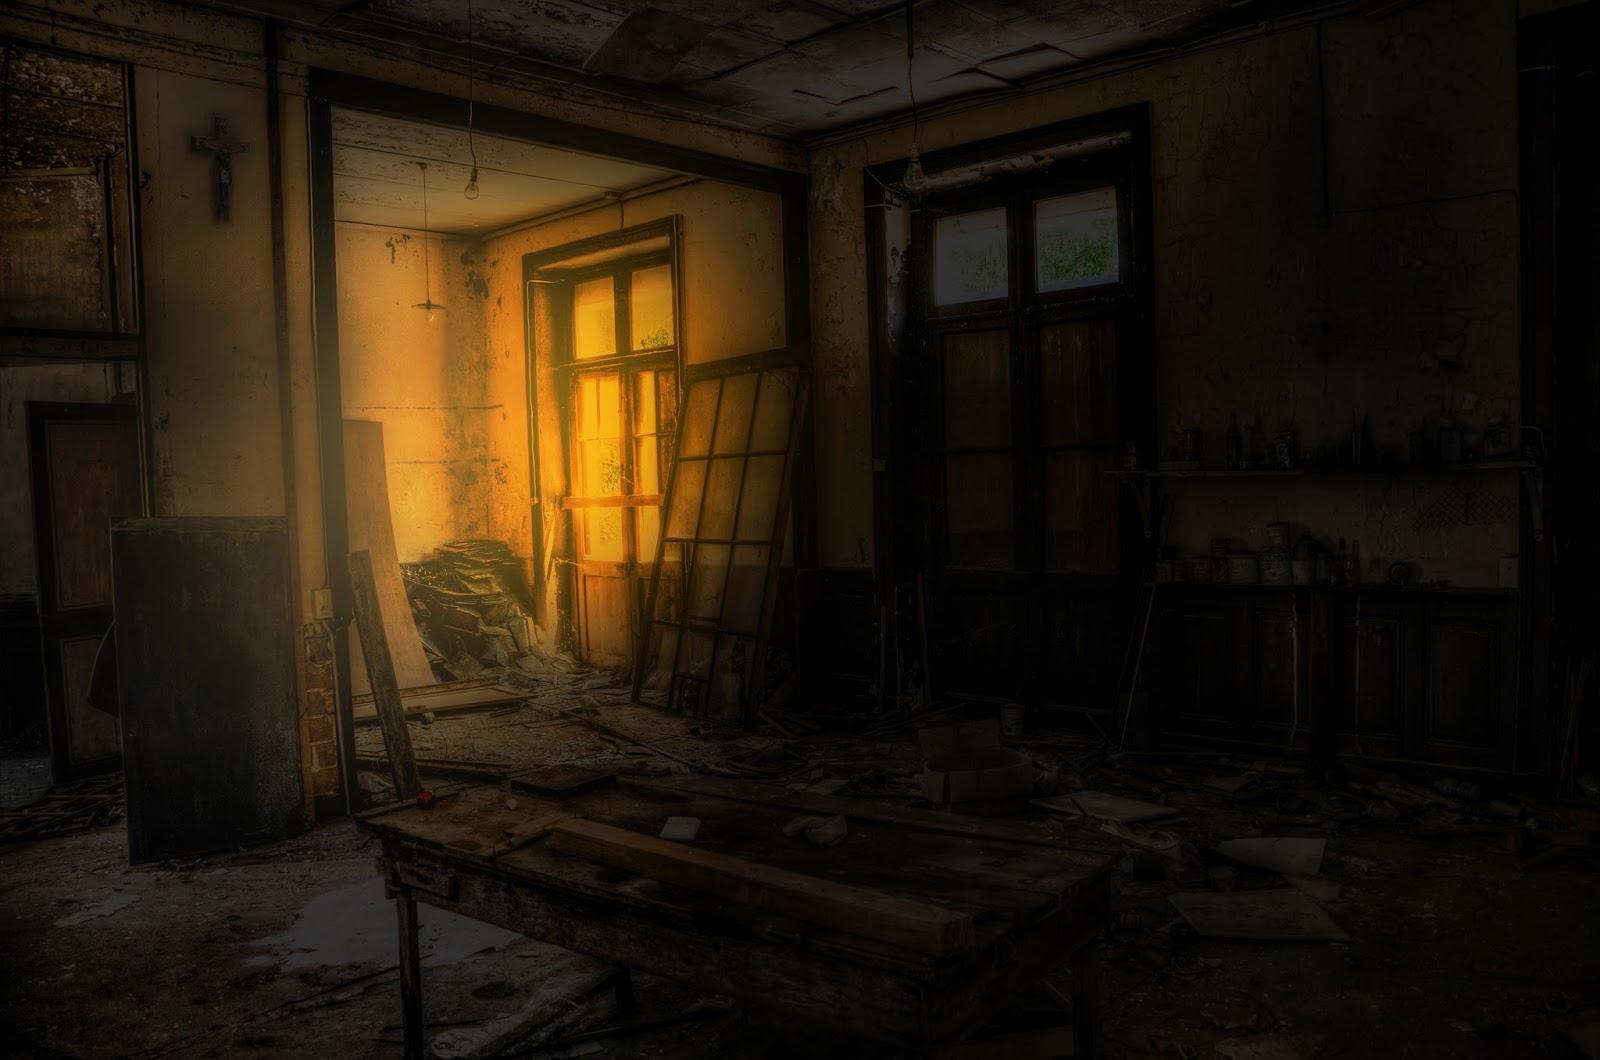 [Casa] Momoi - Página 2 Abandonded-1017454